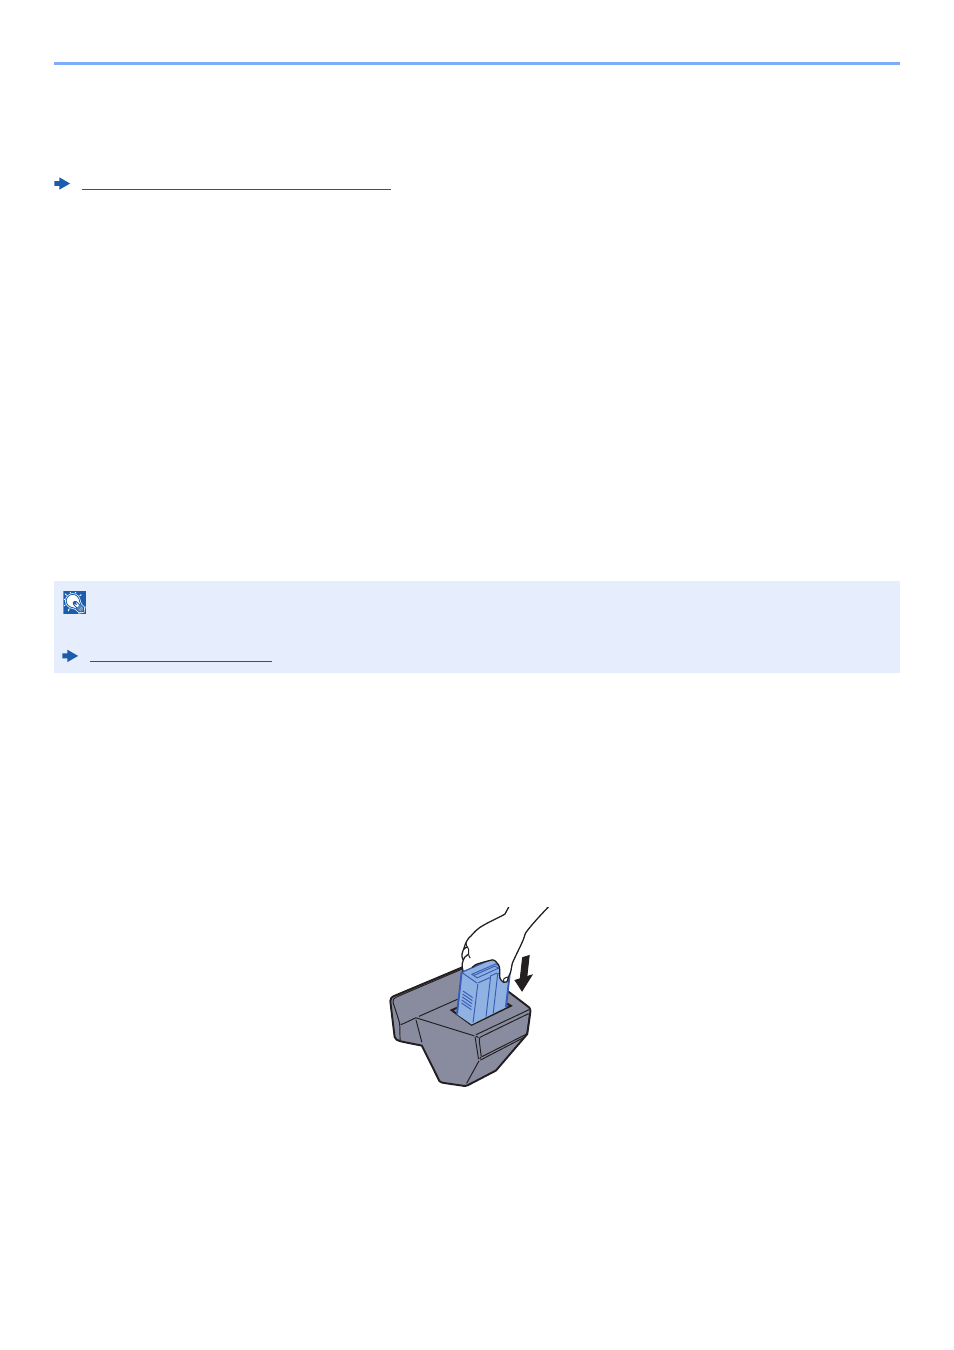 12) ph-7a, 16) dt | Kyocera TASKalfa 2552ci User Manual